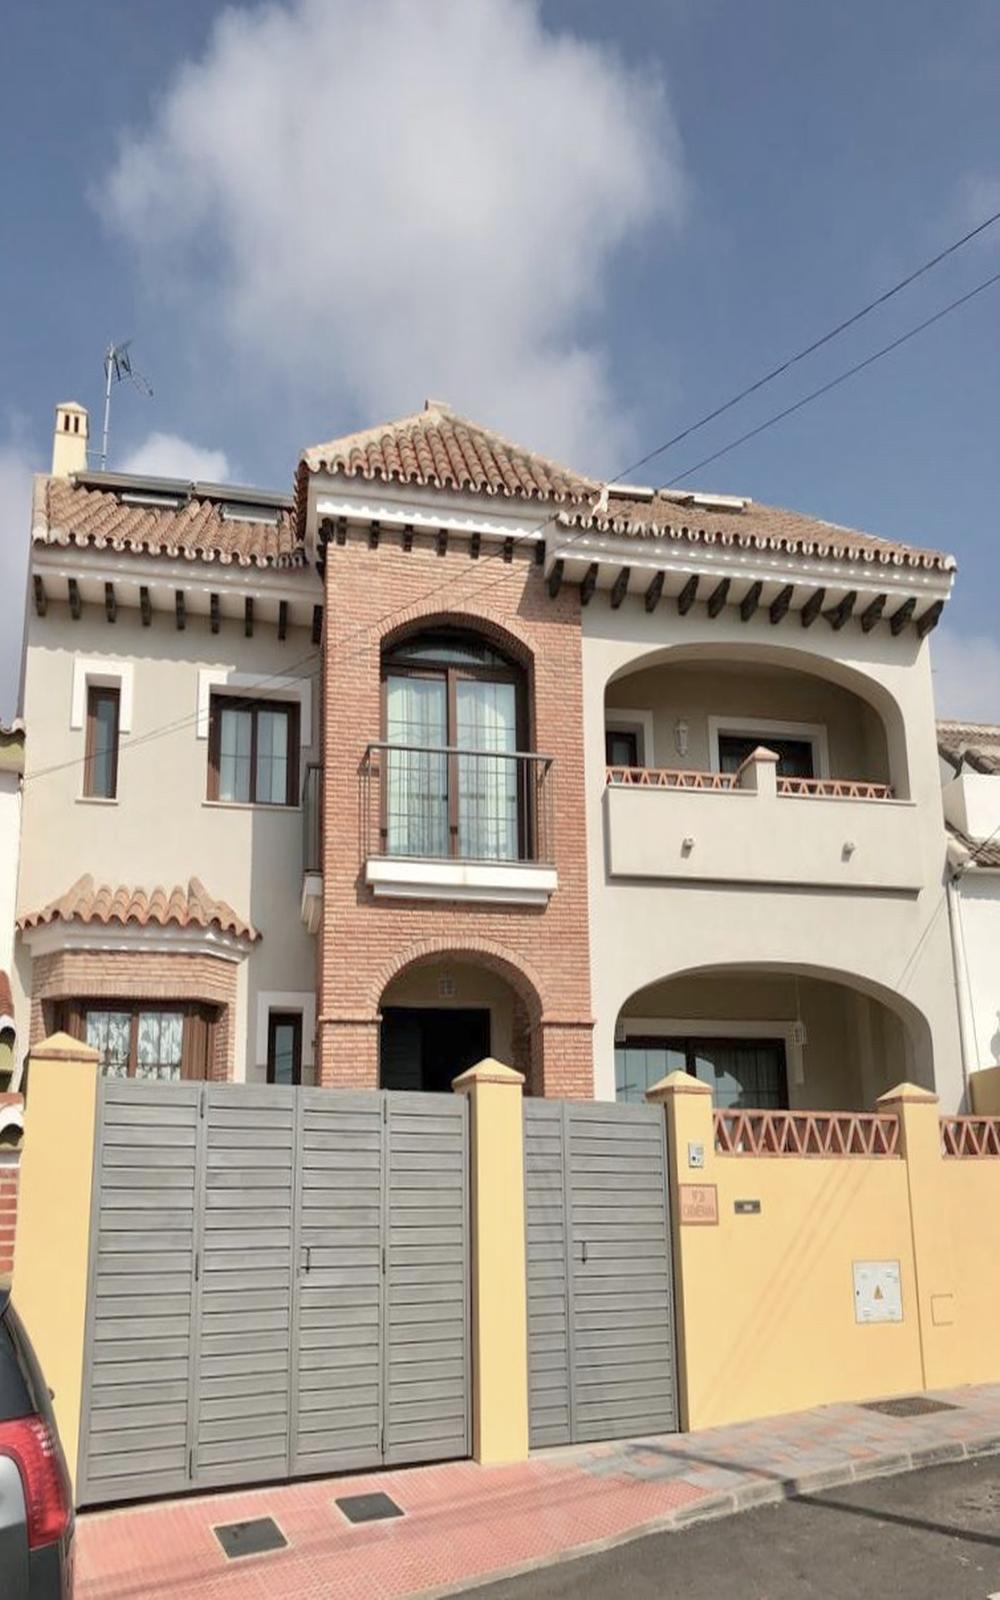 424.51 sqm townhouse built on a 241.12 sqm plot:  - BASEMENT FLOOR (122.83 sqm): bathroom, kitchen i,Spain